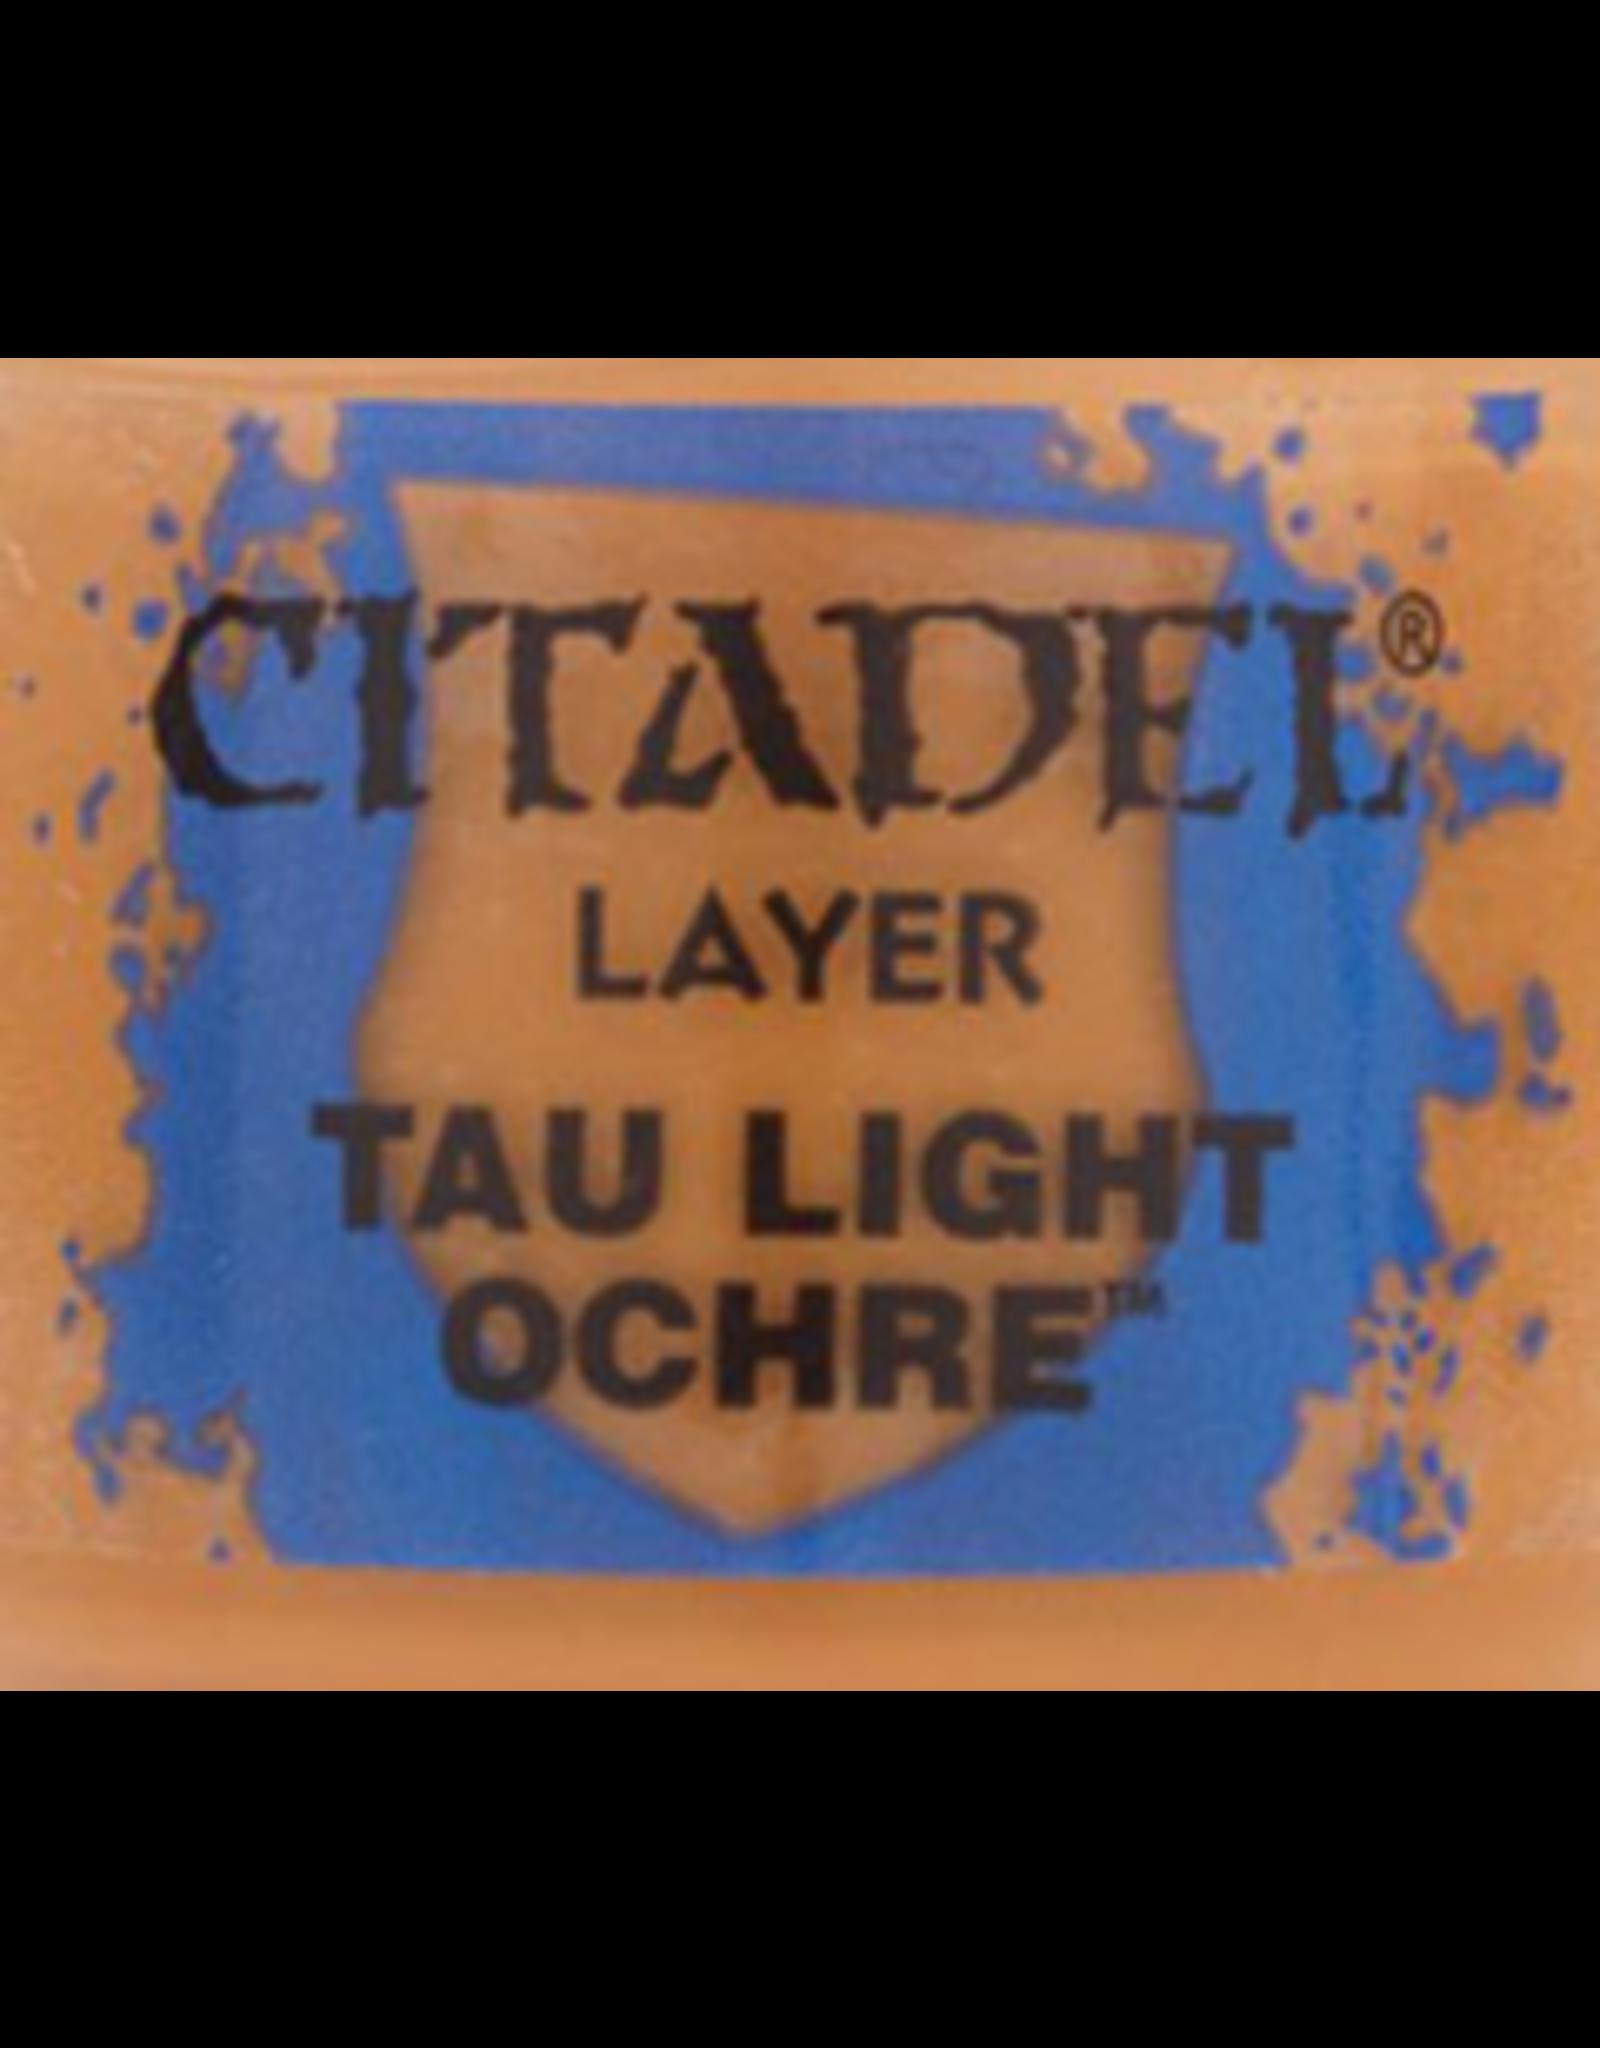 Games Workshop Citadel Layer Tau Light Ochre